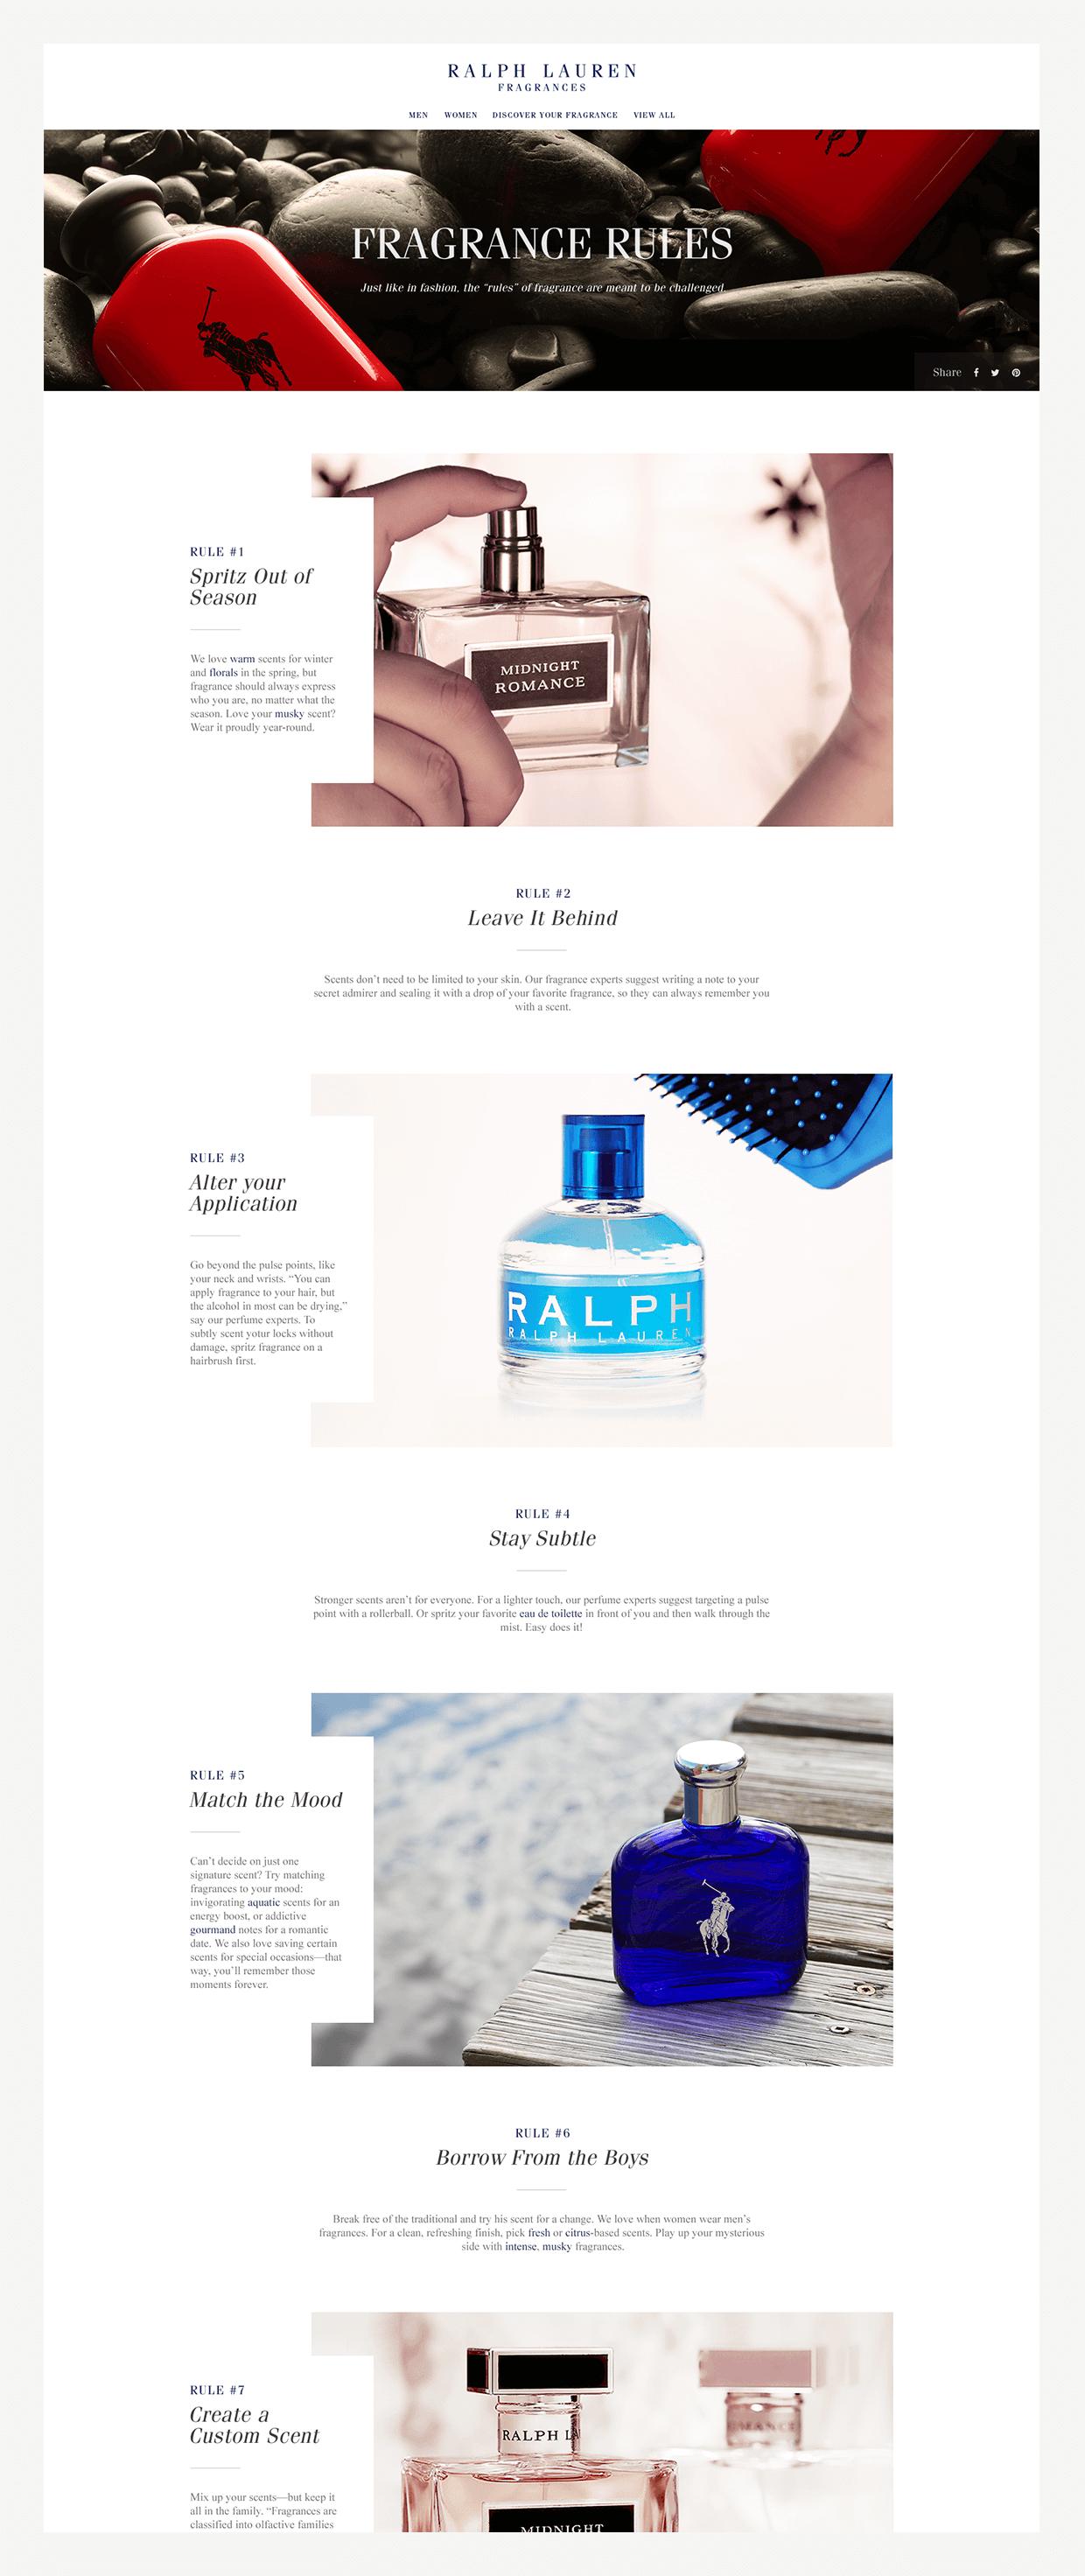 fragrance rules of ralph lauren